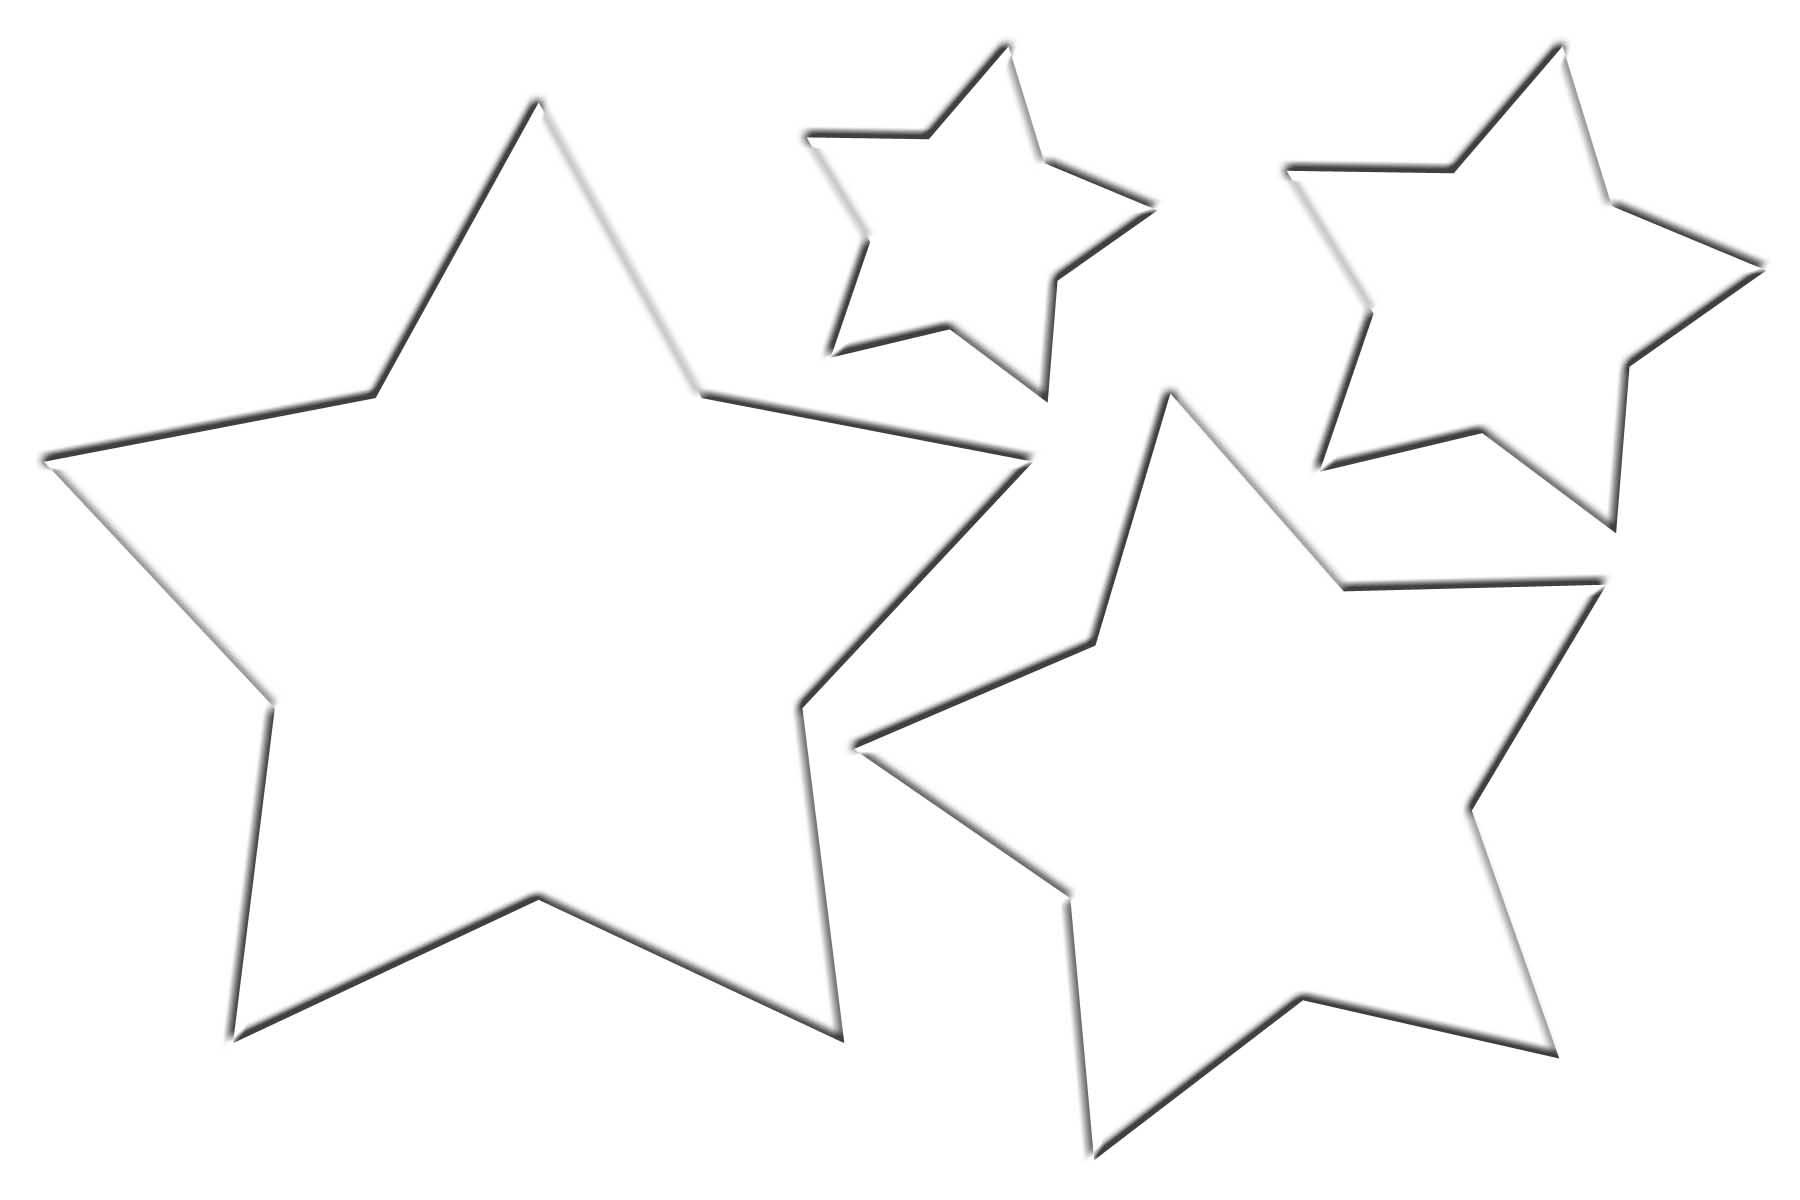 PillowChristmasTree star template - WonderfulDIY.com